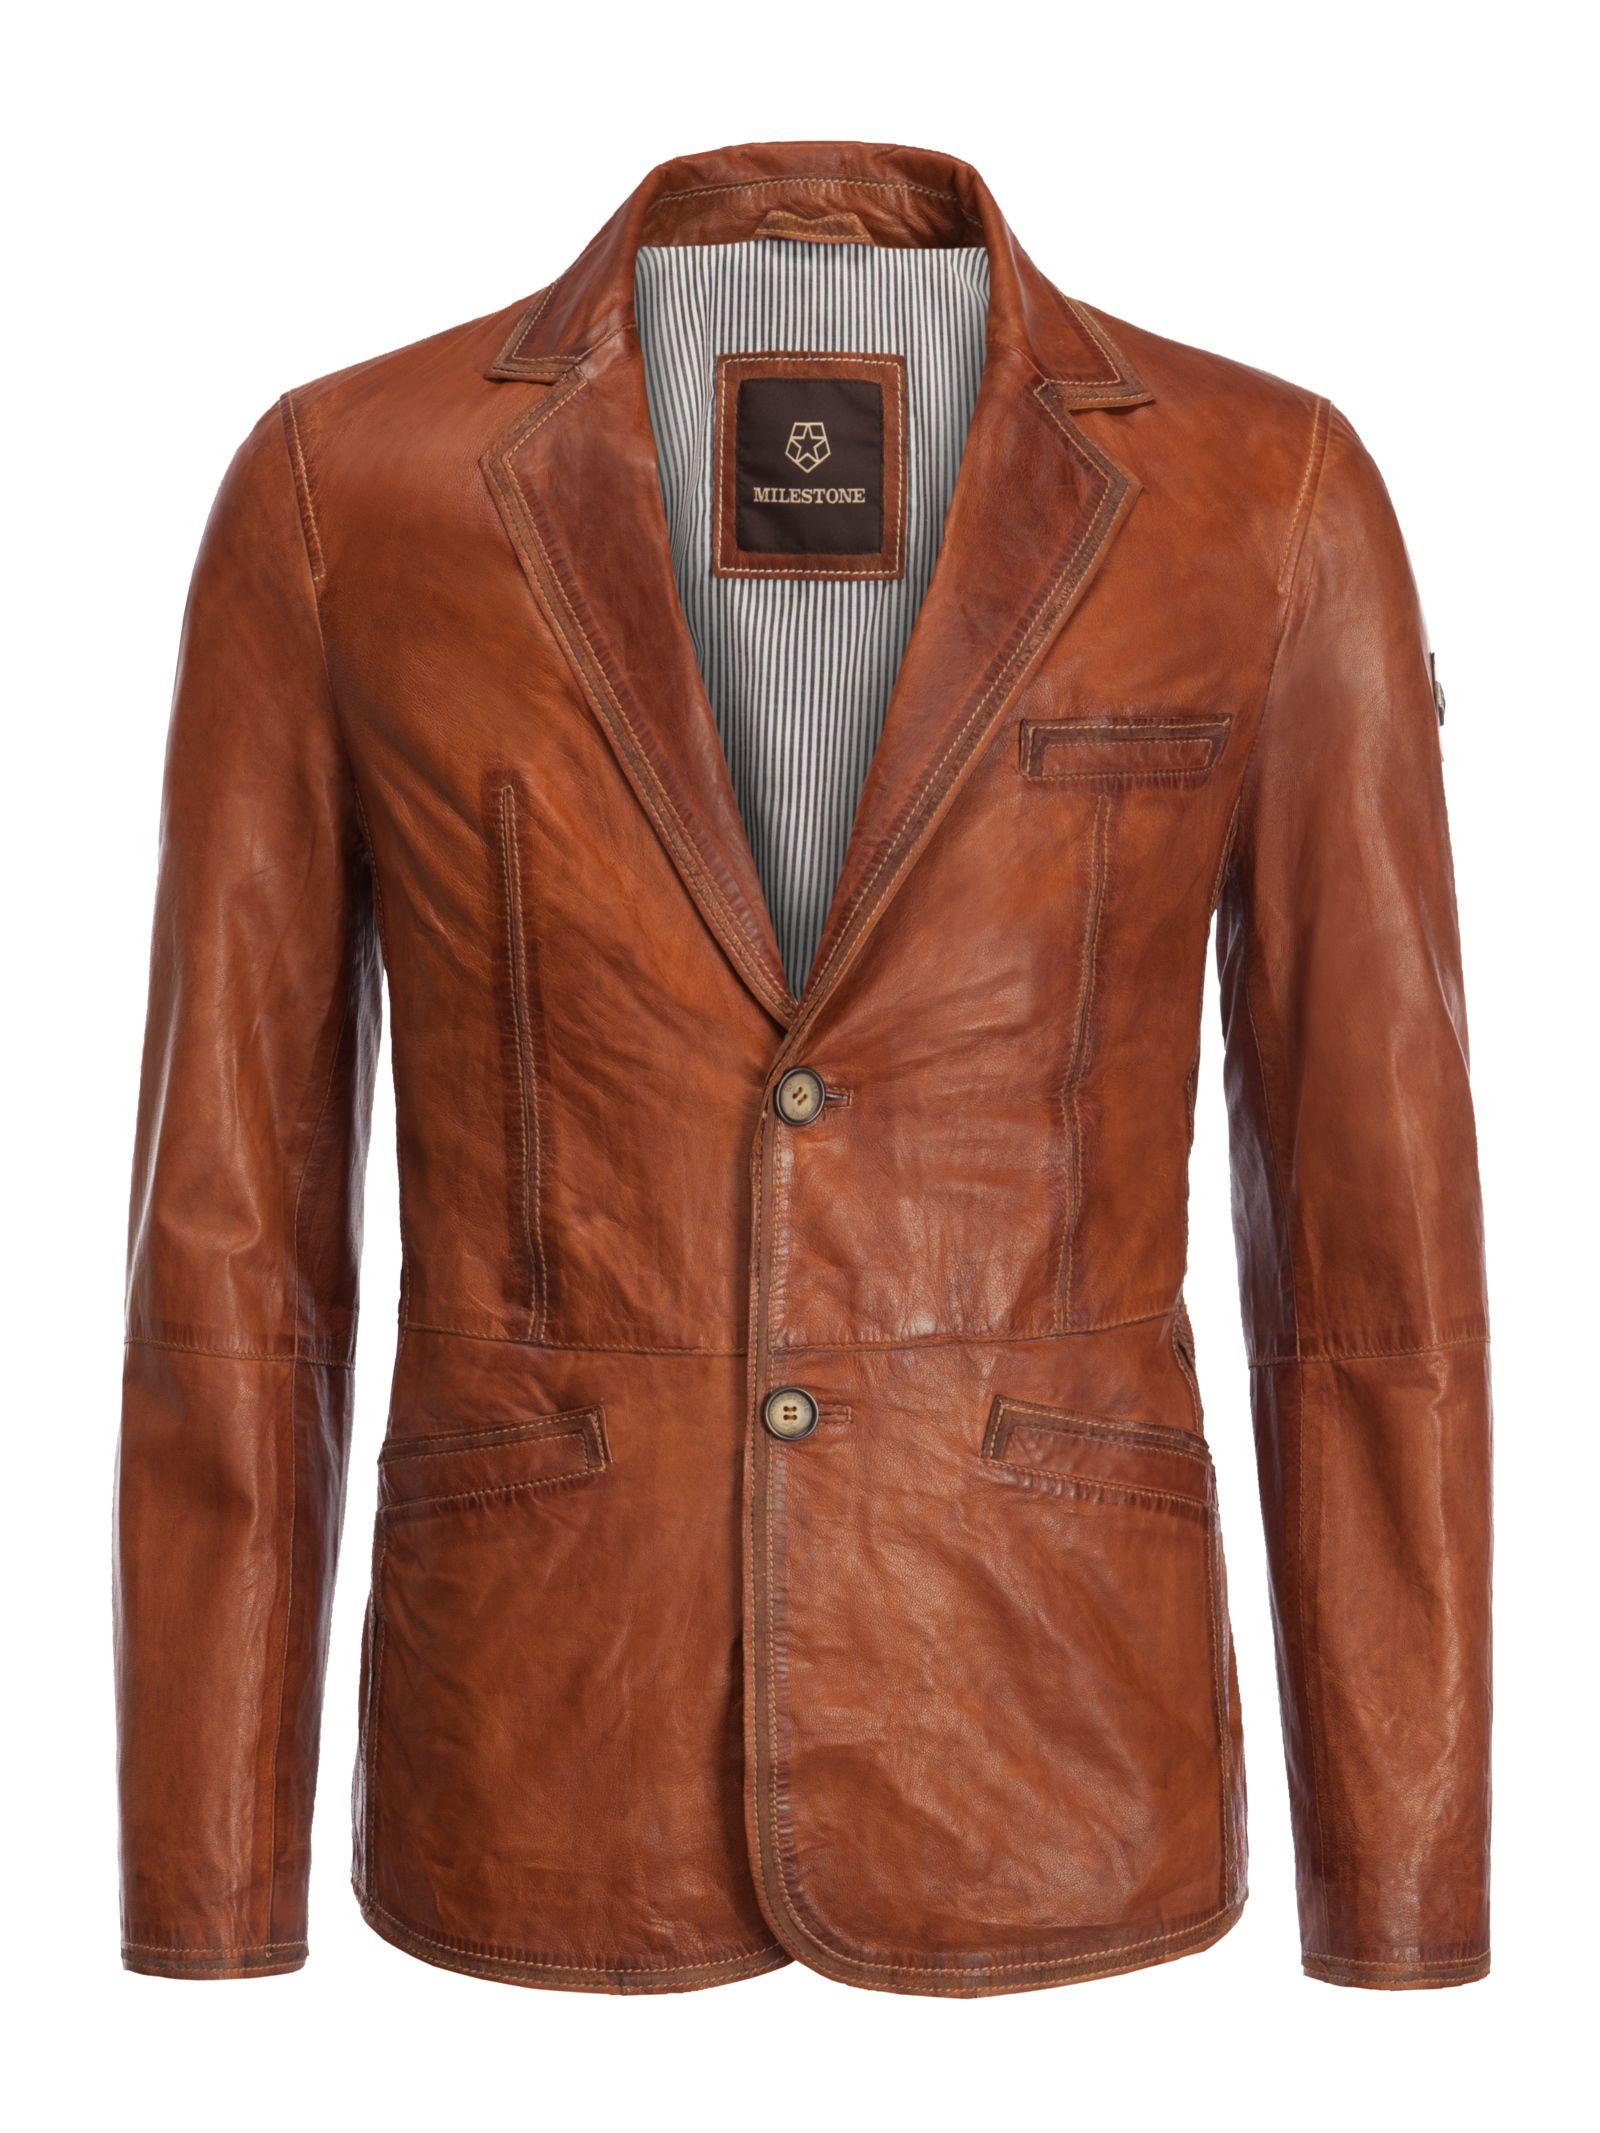 Milestone Softes Vintage Leather Jacket cognac Men's